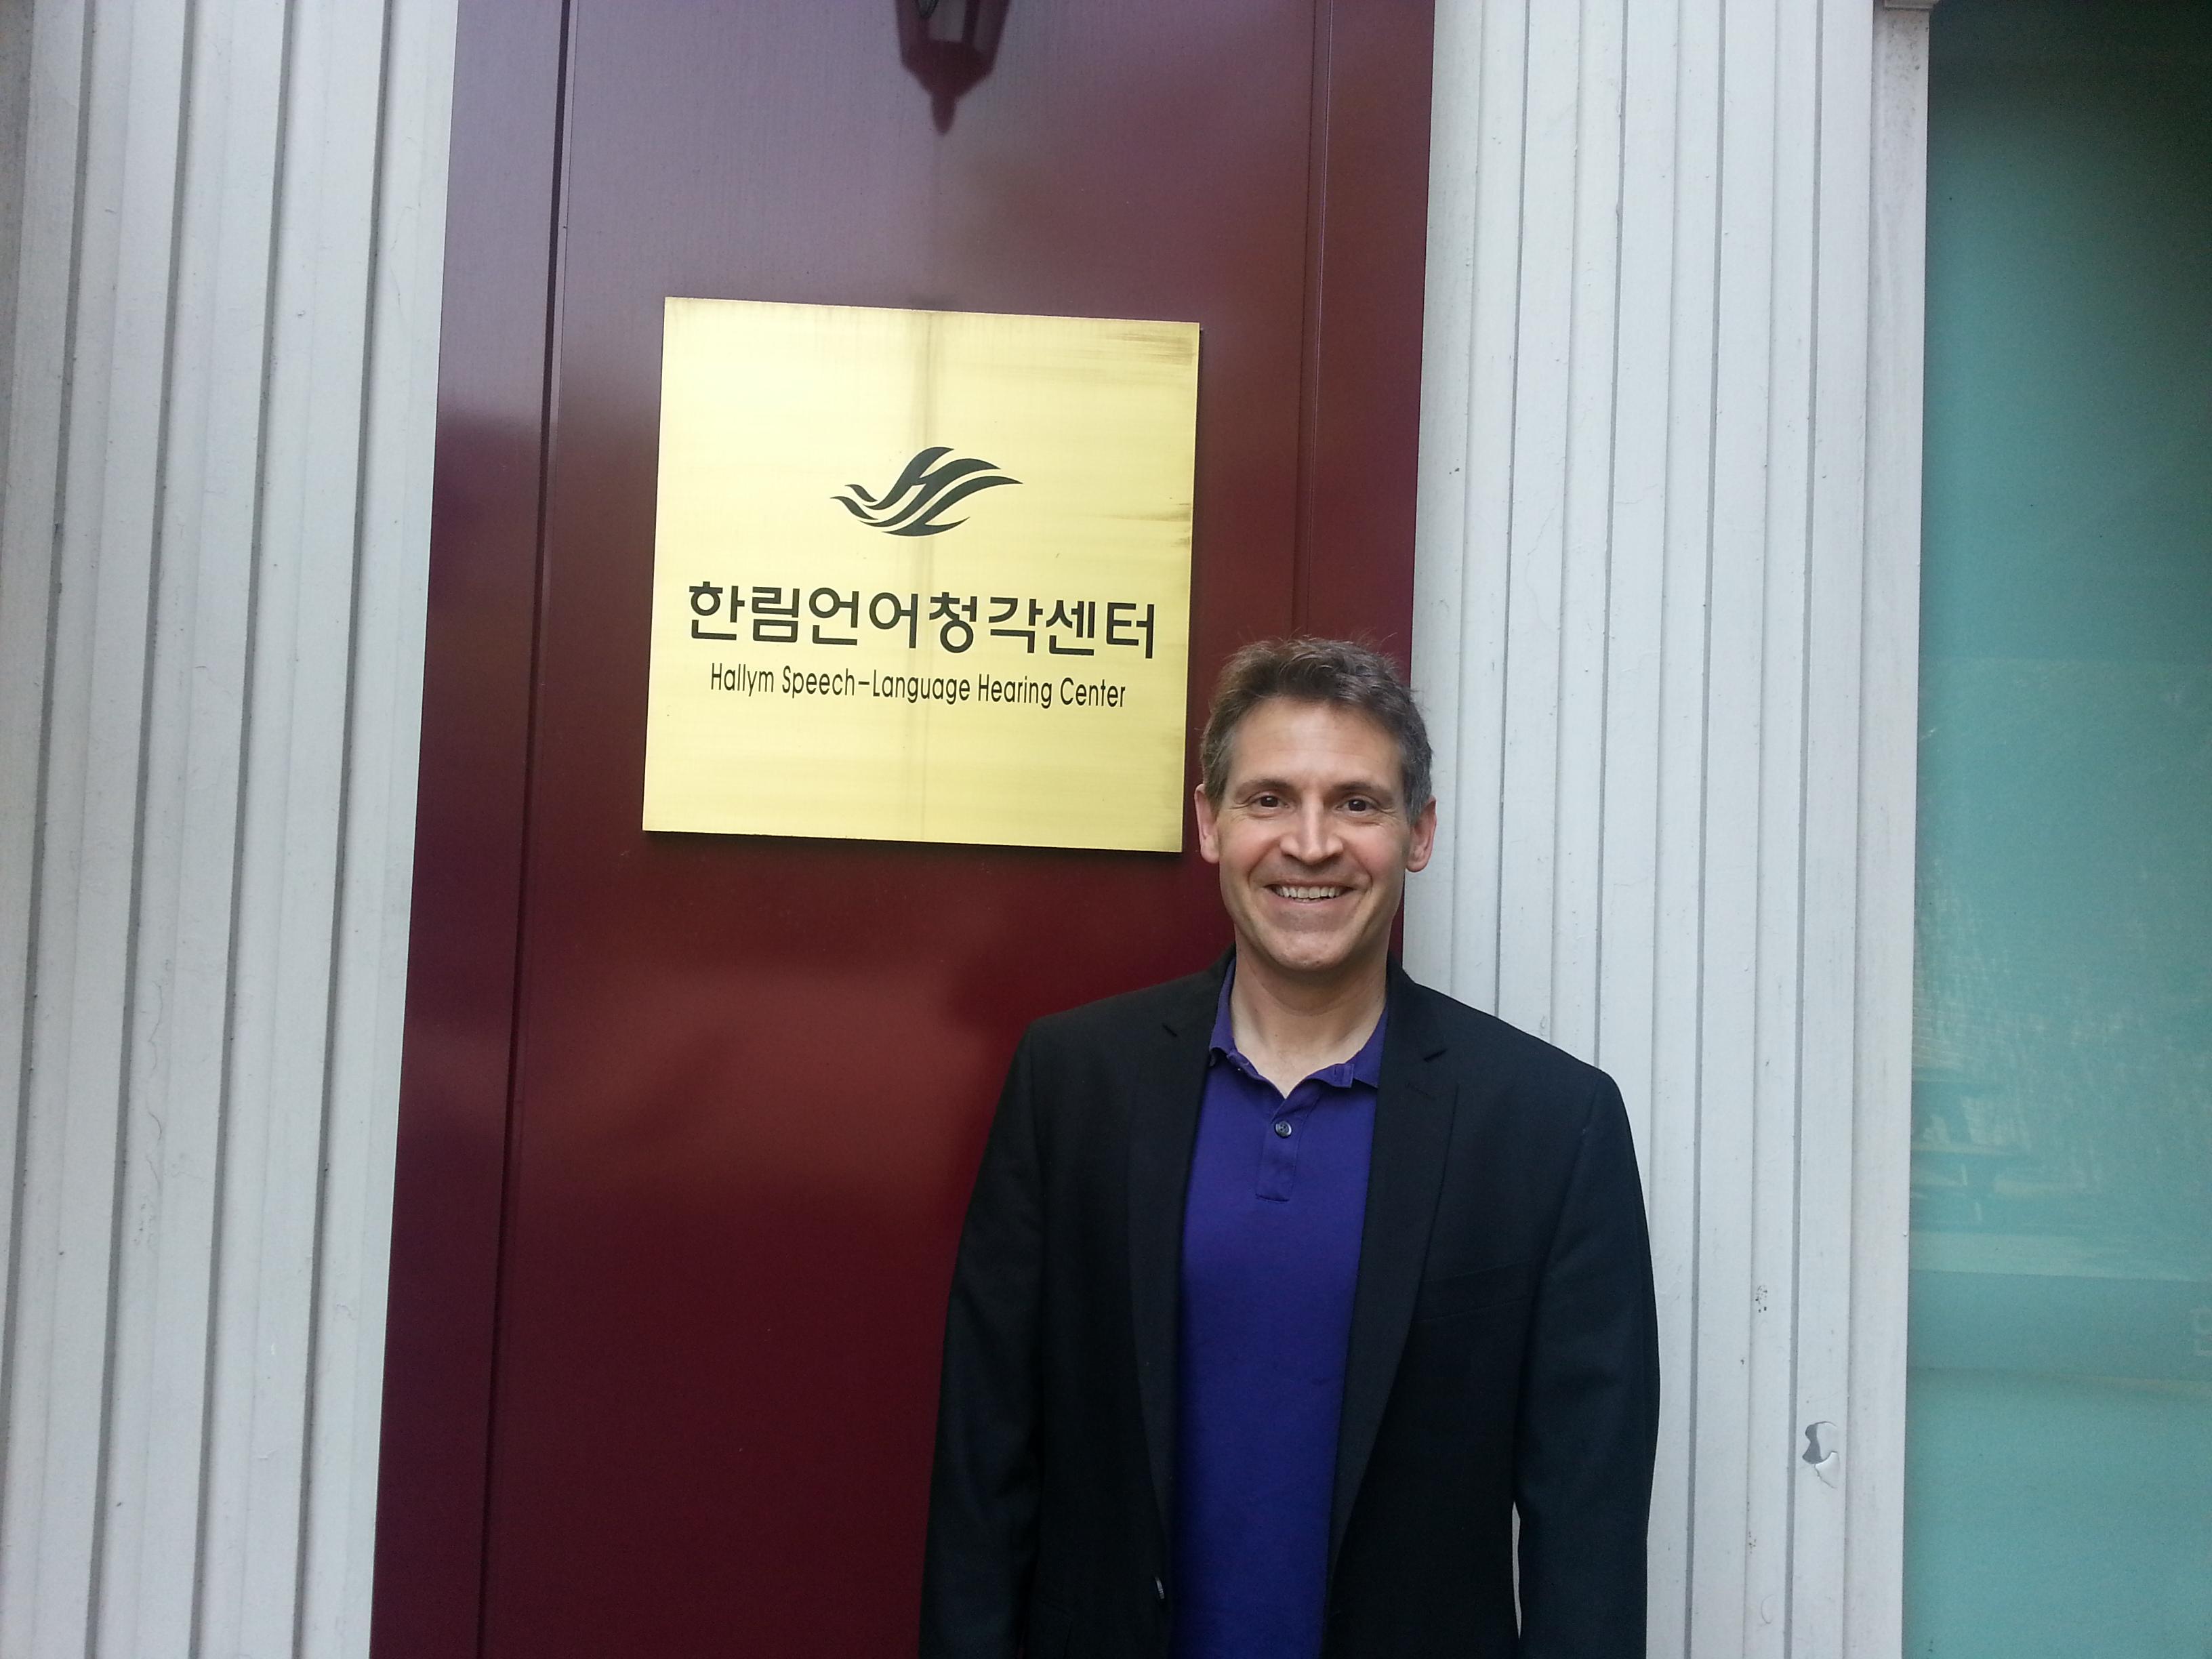 Photo of John McCarthy at the Hallym Speech-Language Hearing Center